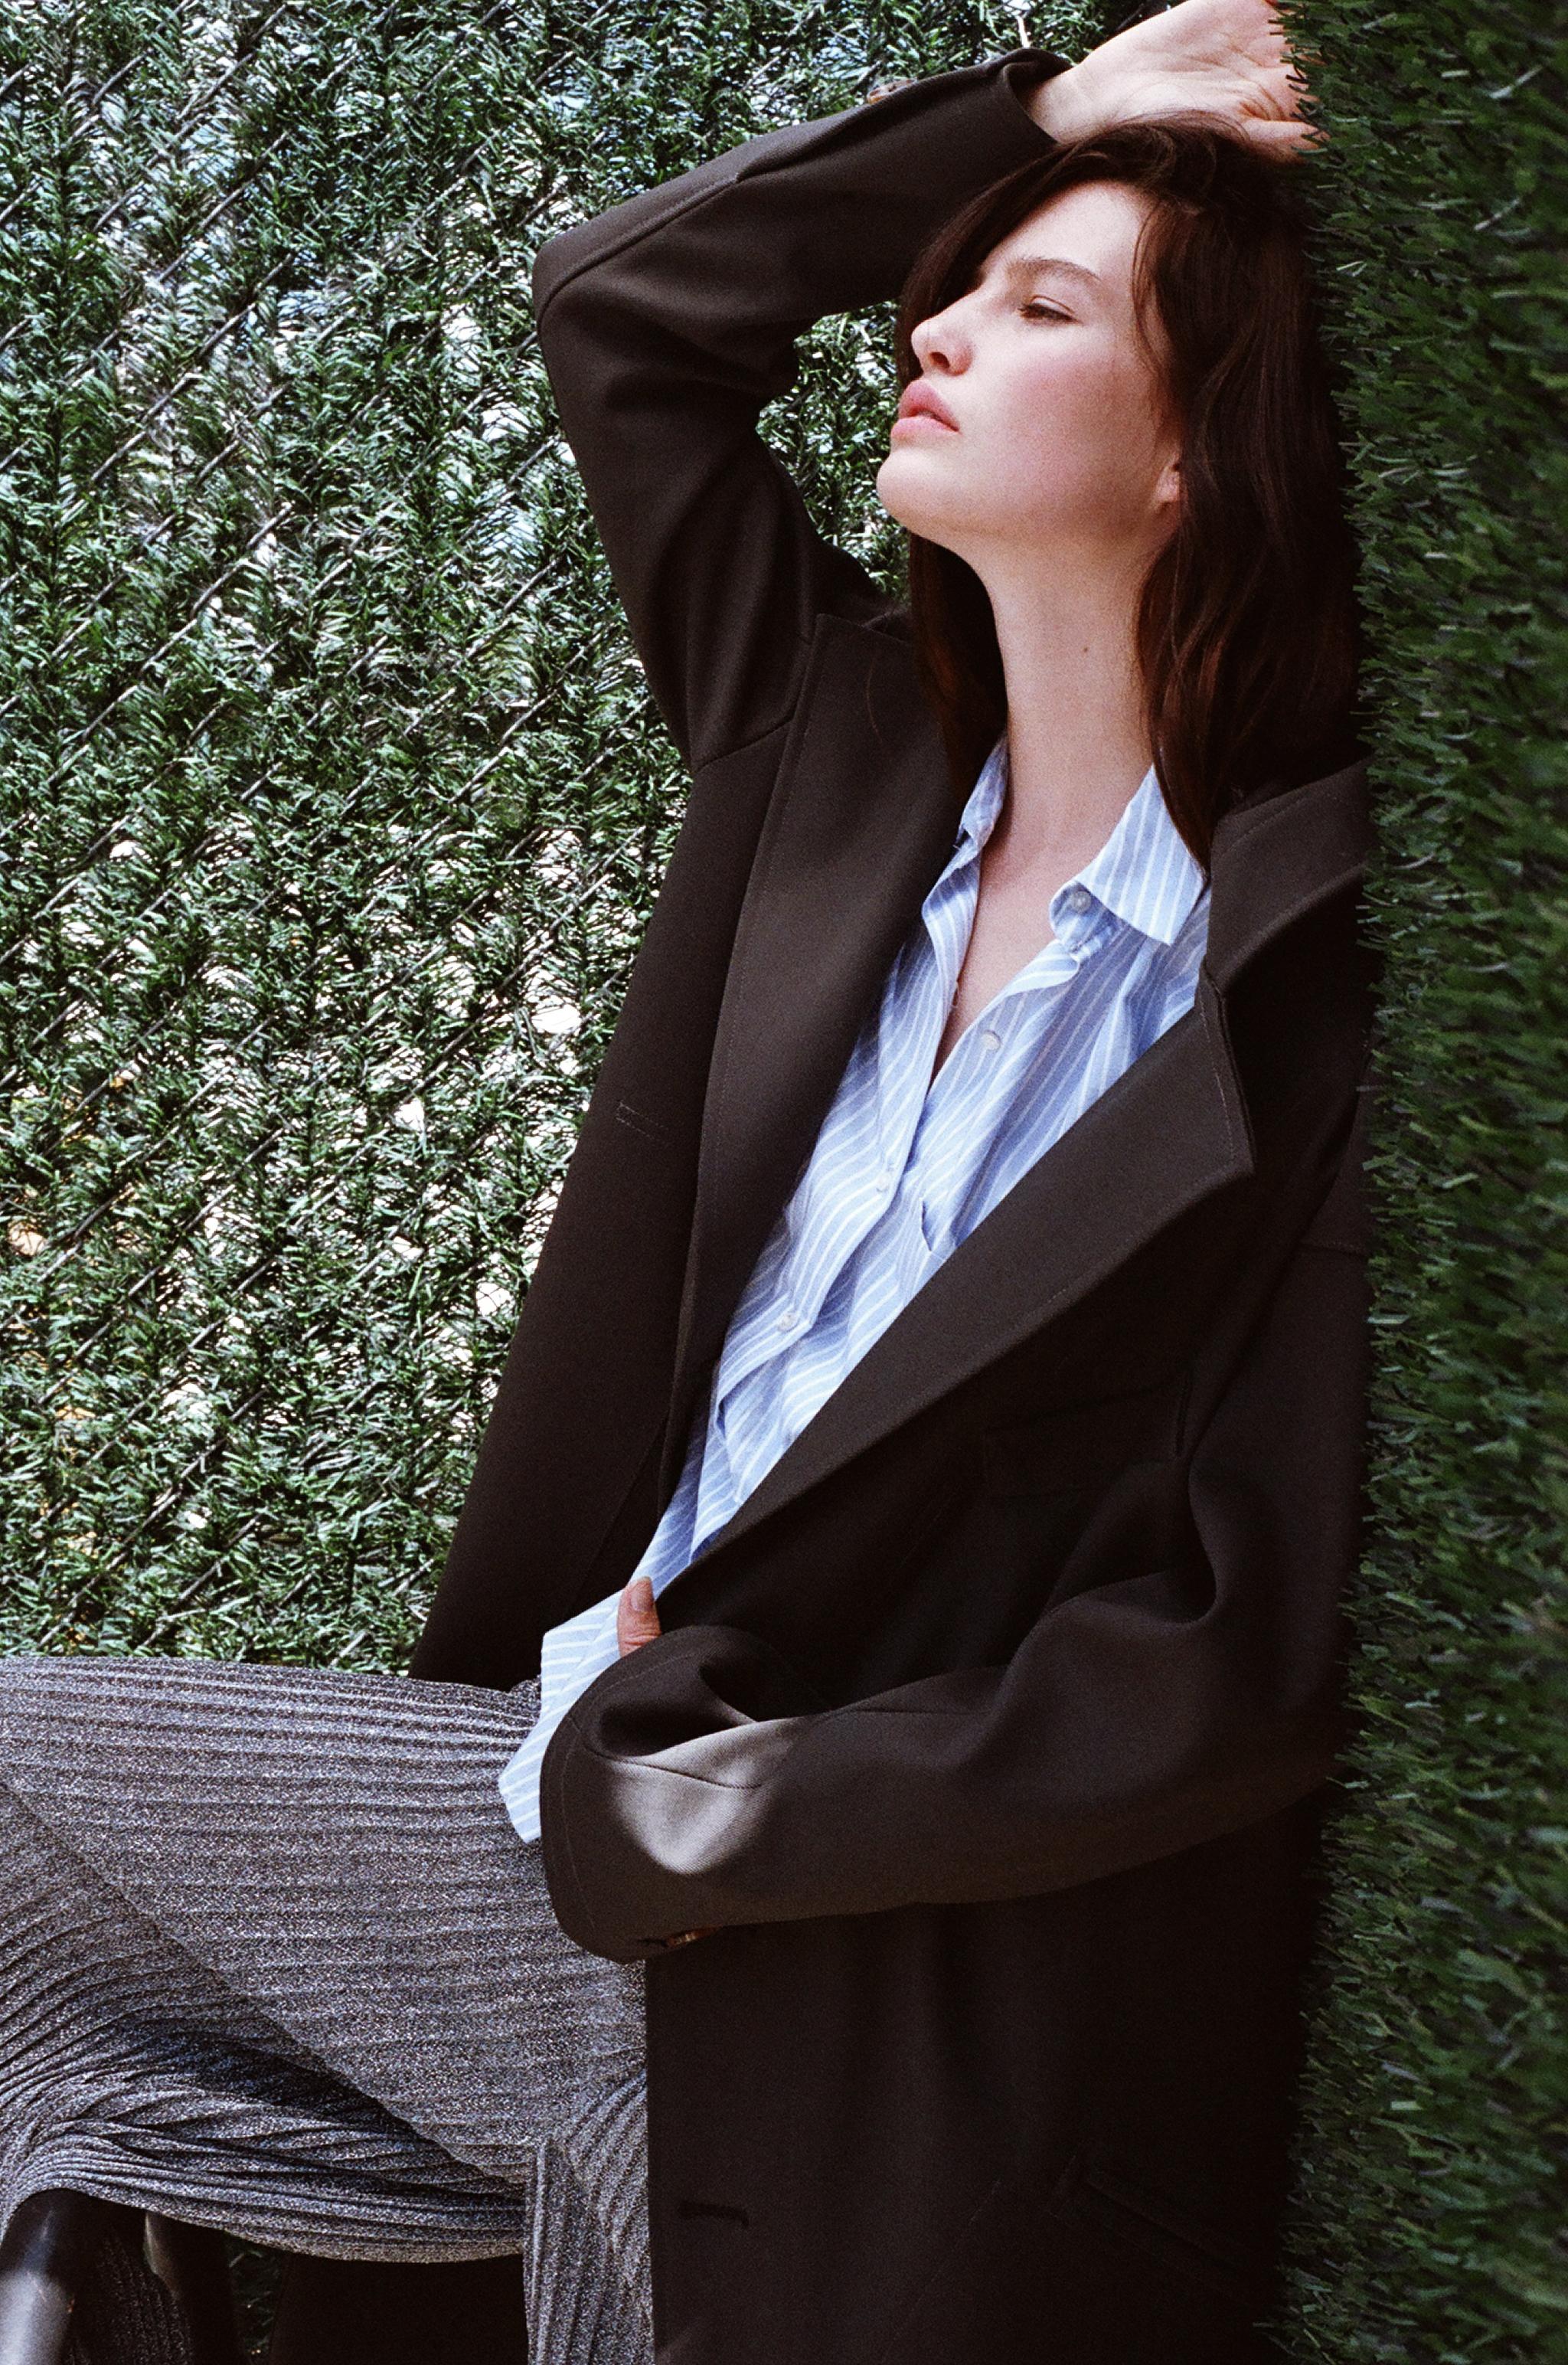 coat  HOMIC , shirt RAG & BONE, metallic trousers VINTAGE